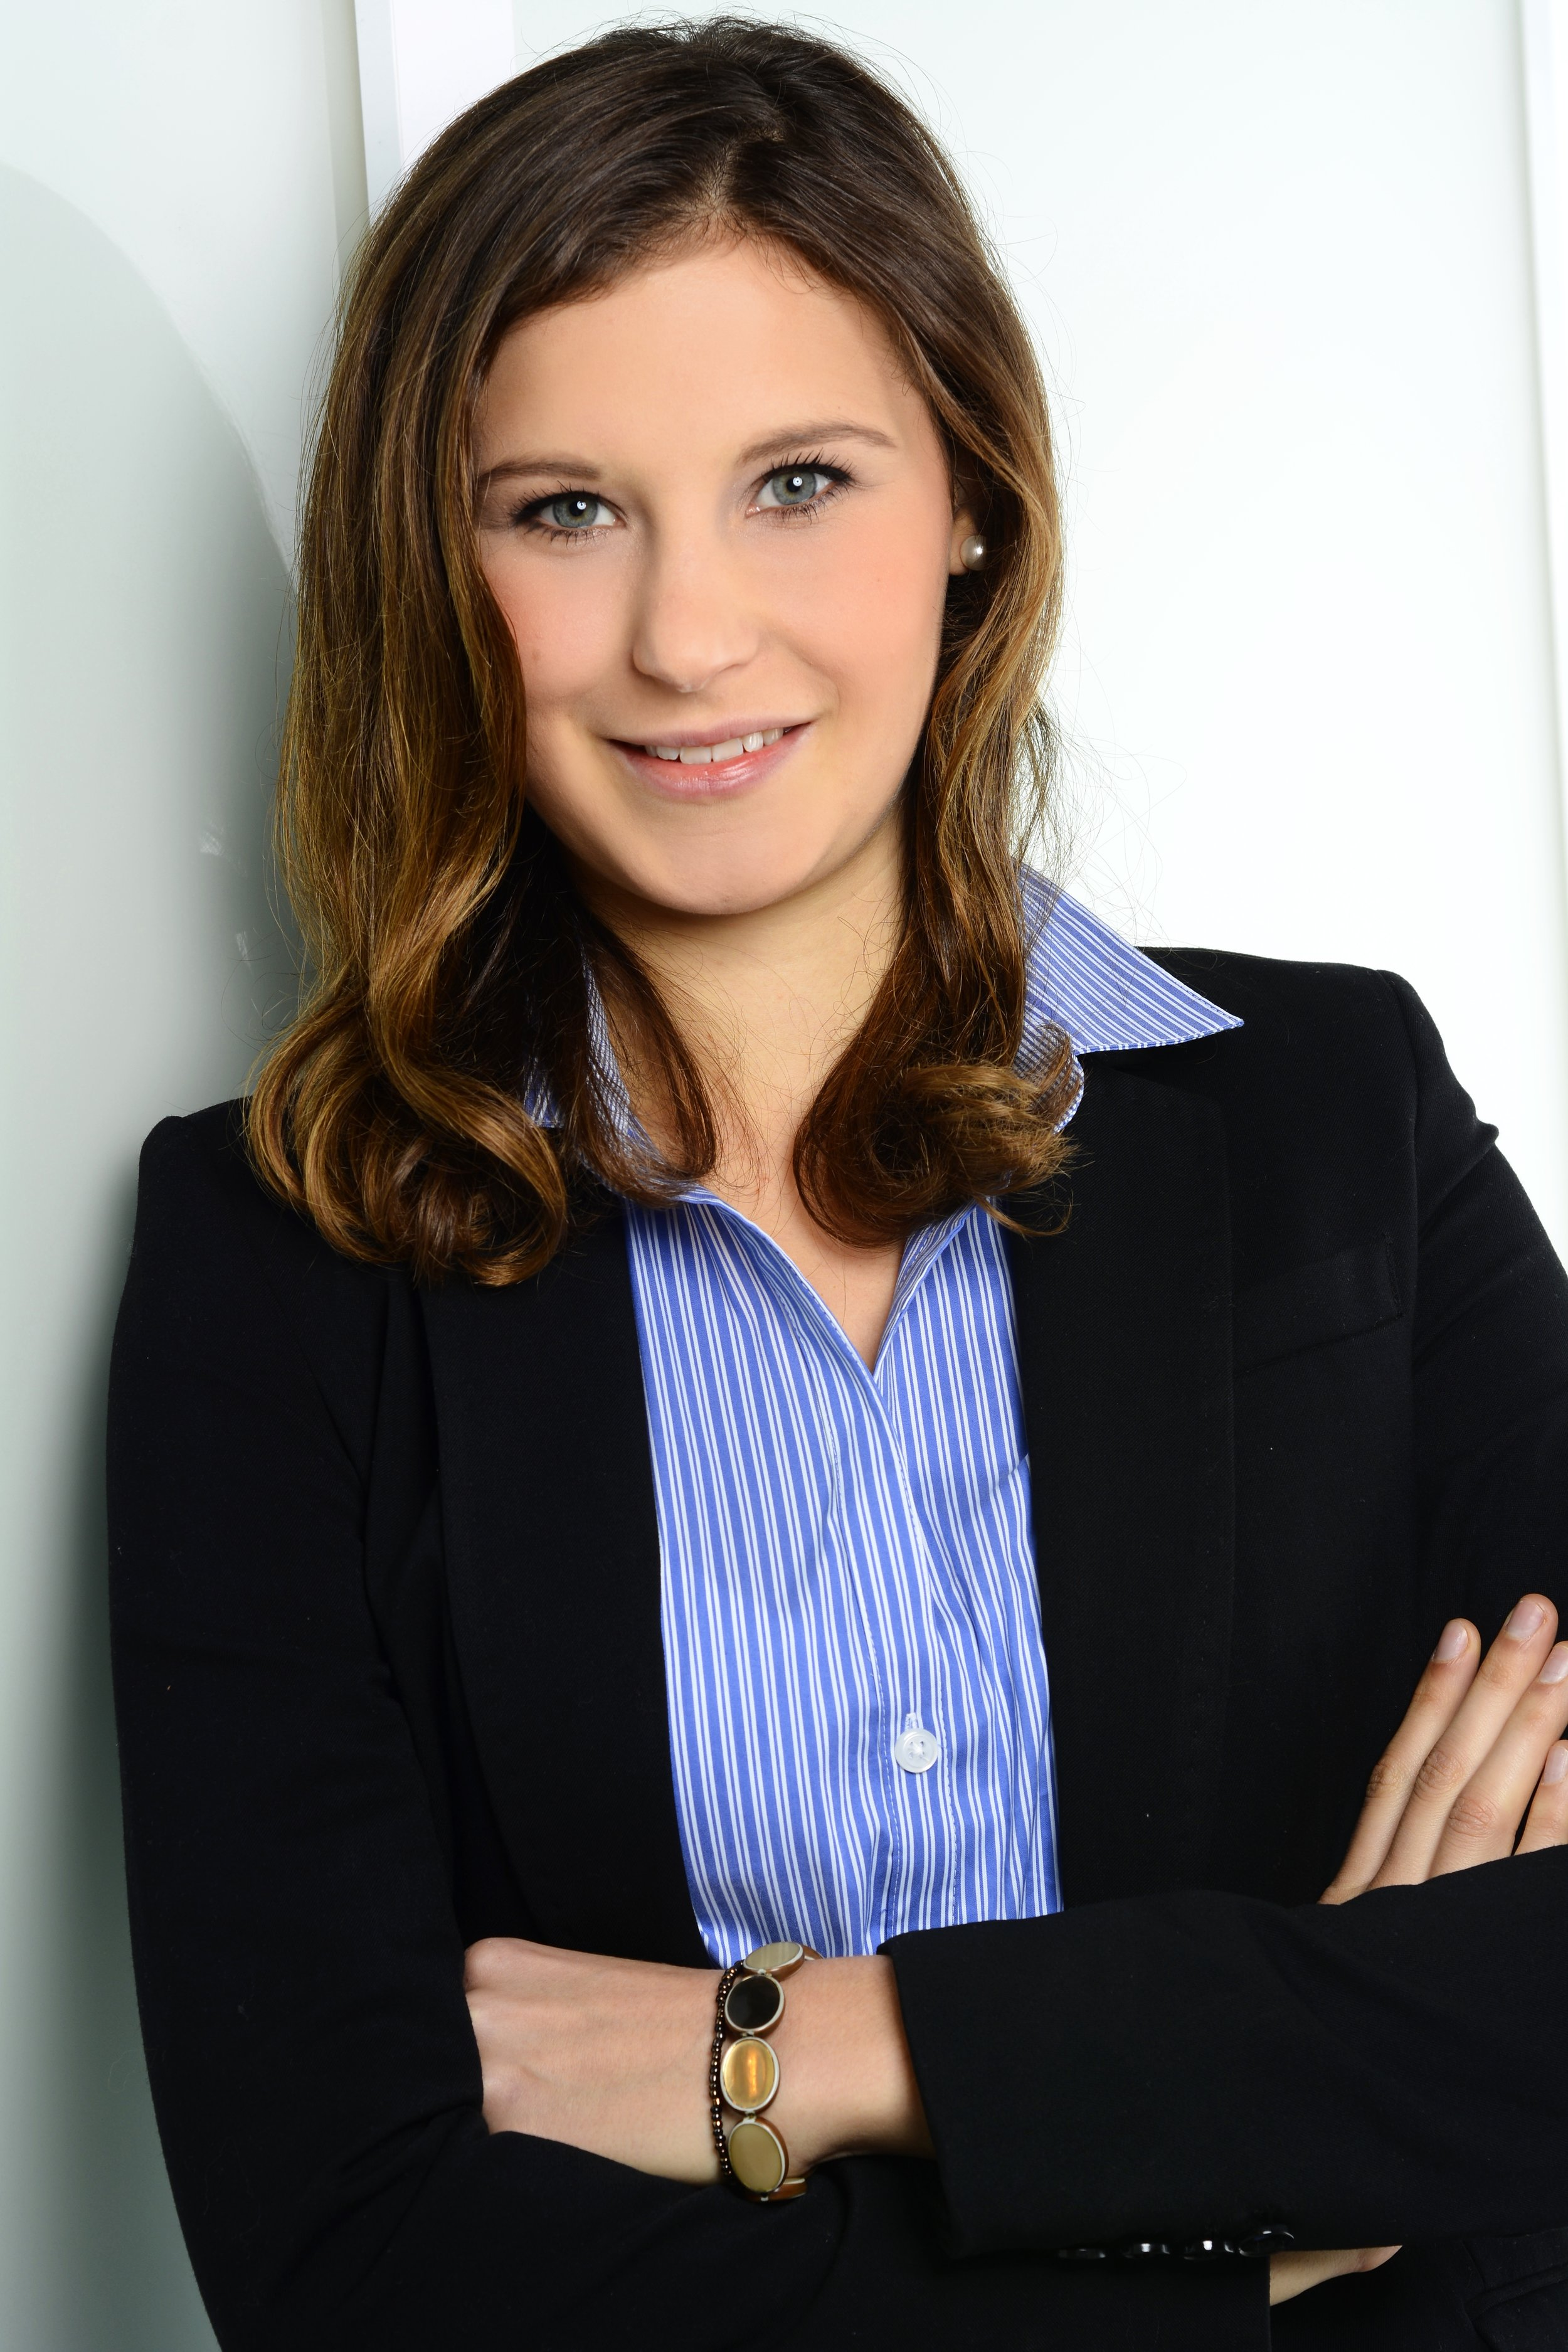 20160506_ Johanna Riesenbeck Profilbild.jpg